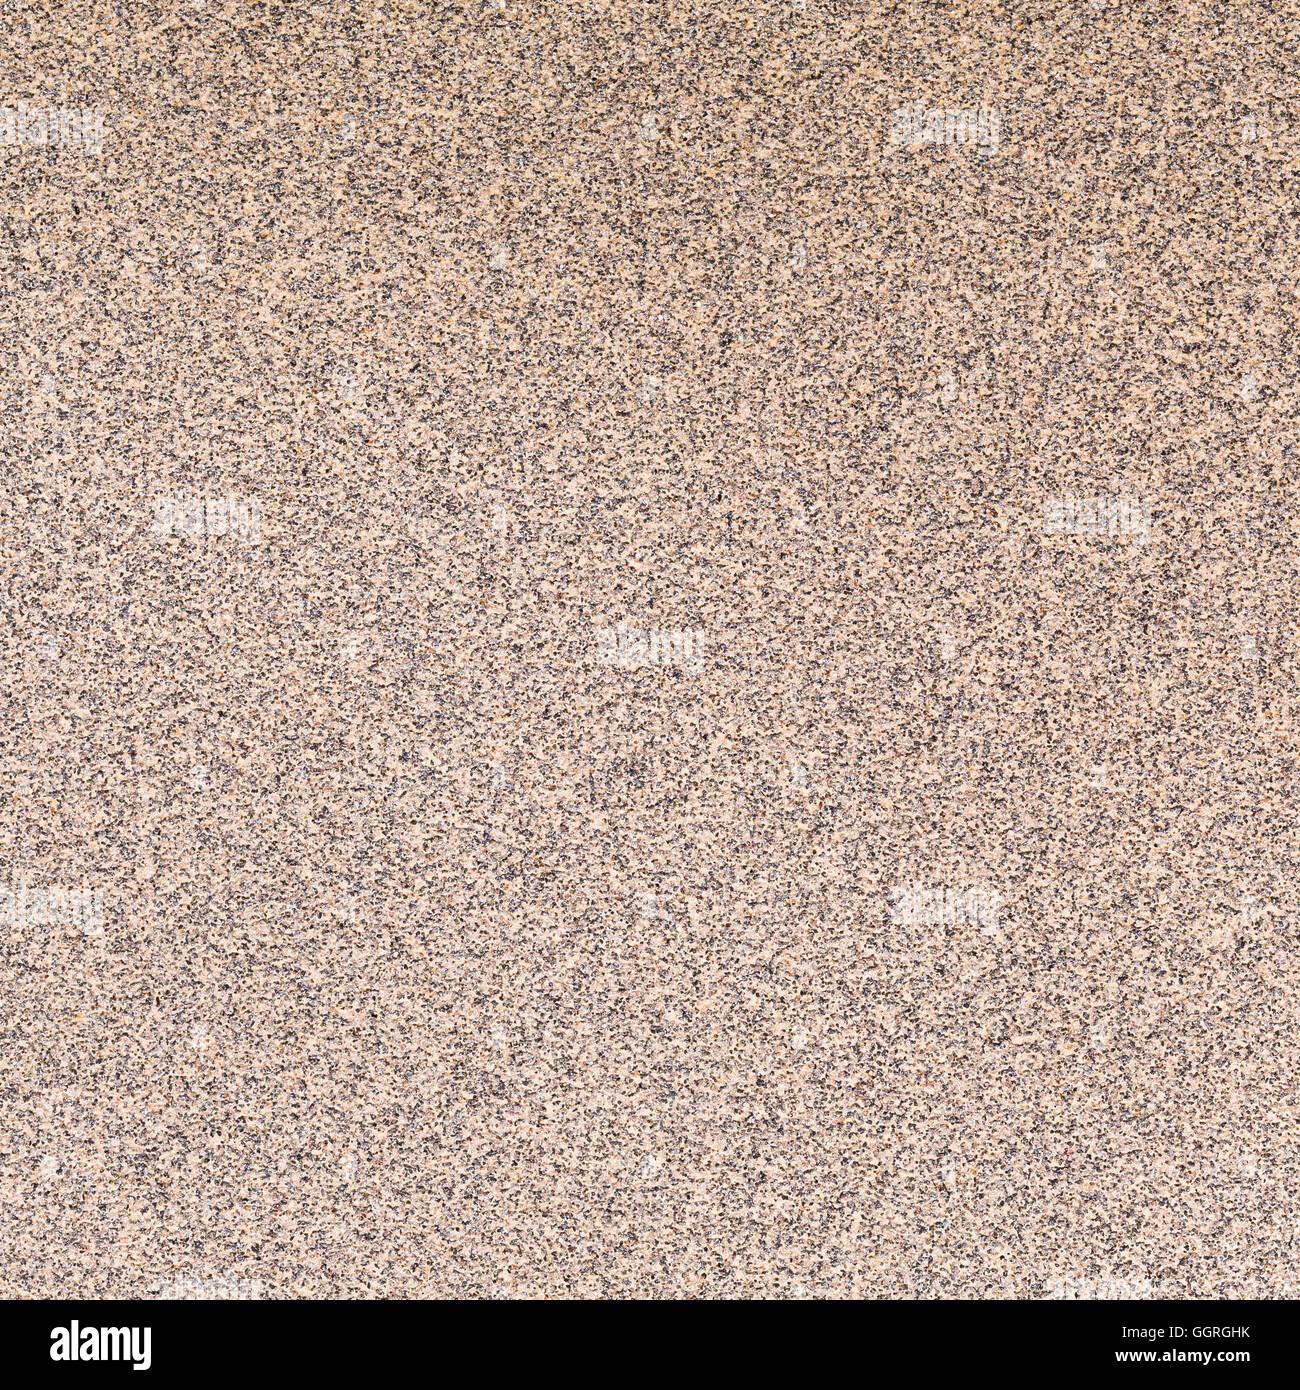 Sheets of sandpaper texture background, sand, pelt - Stock Image